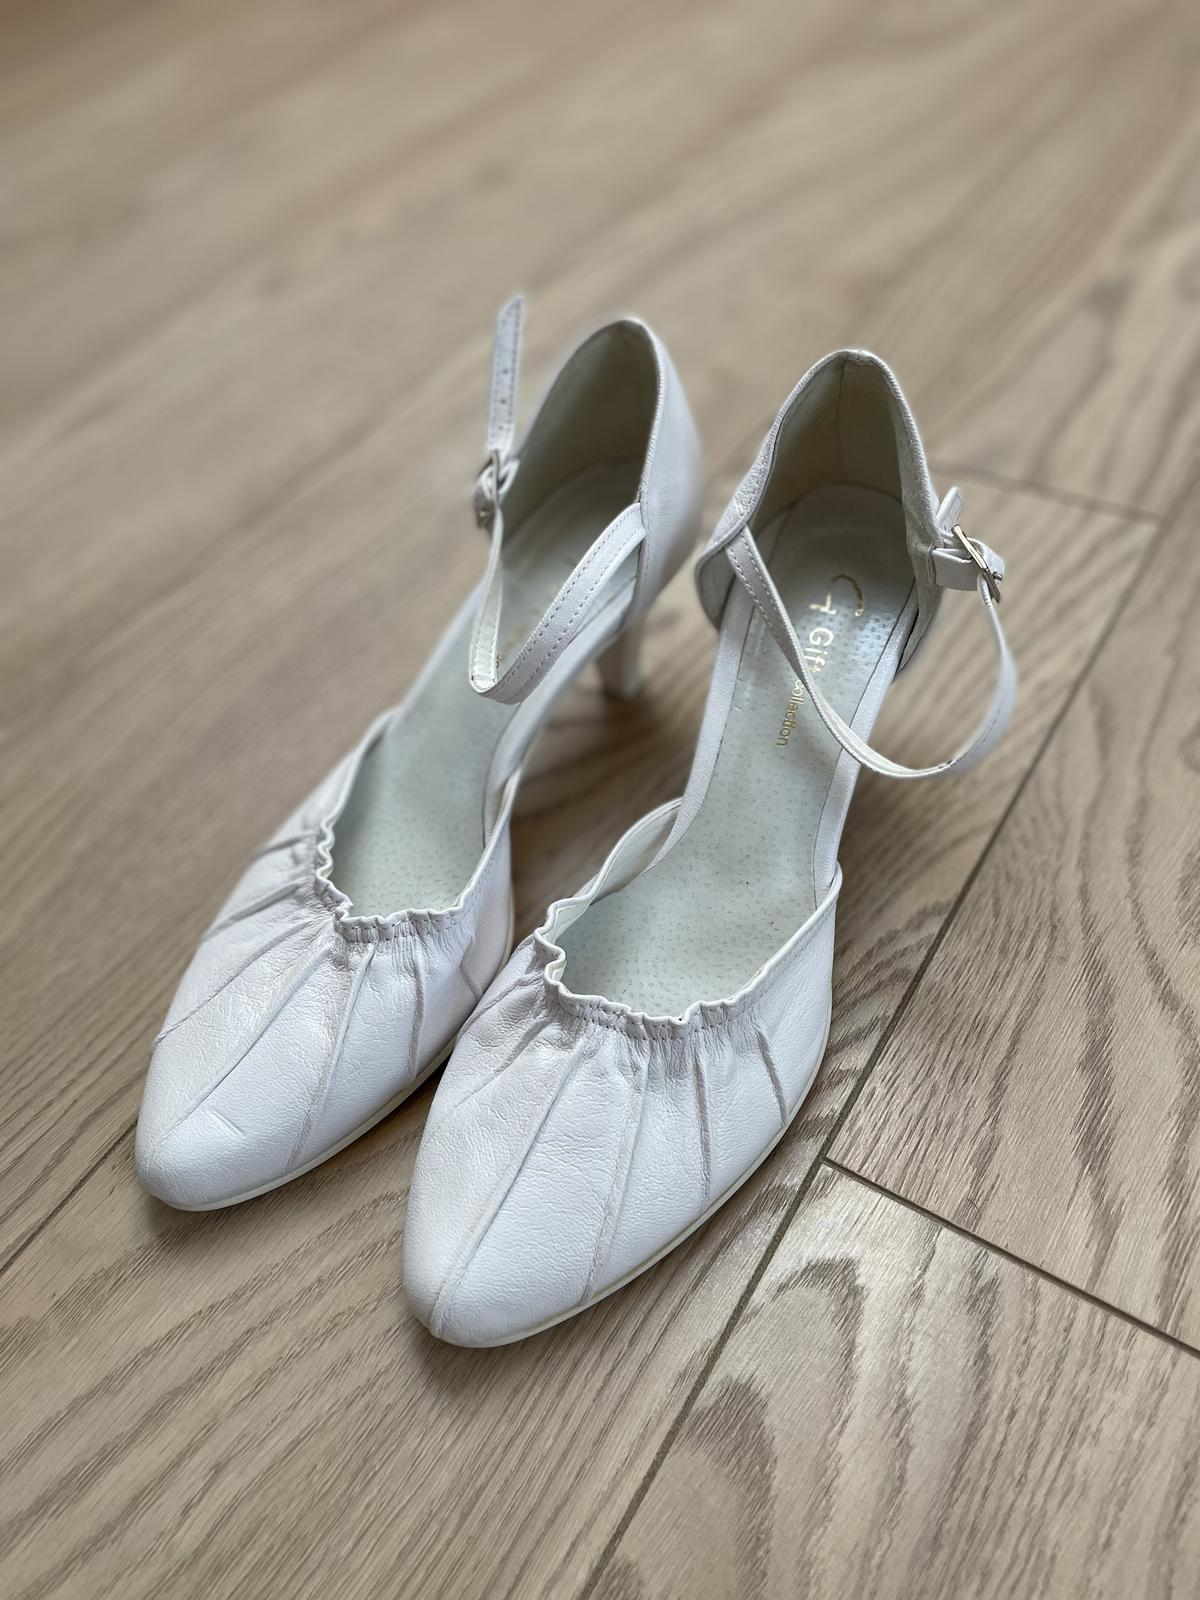 Svadobné topánky veľ. 37 - Obrázok č. 1